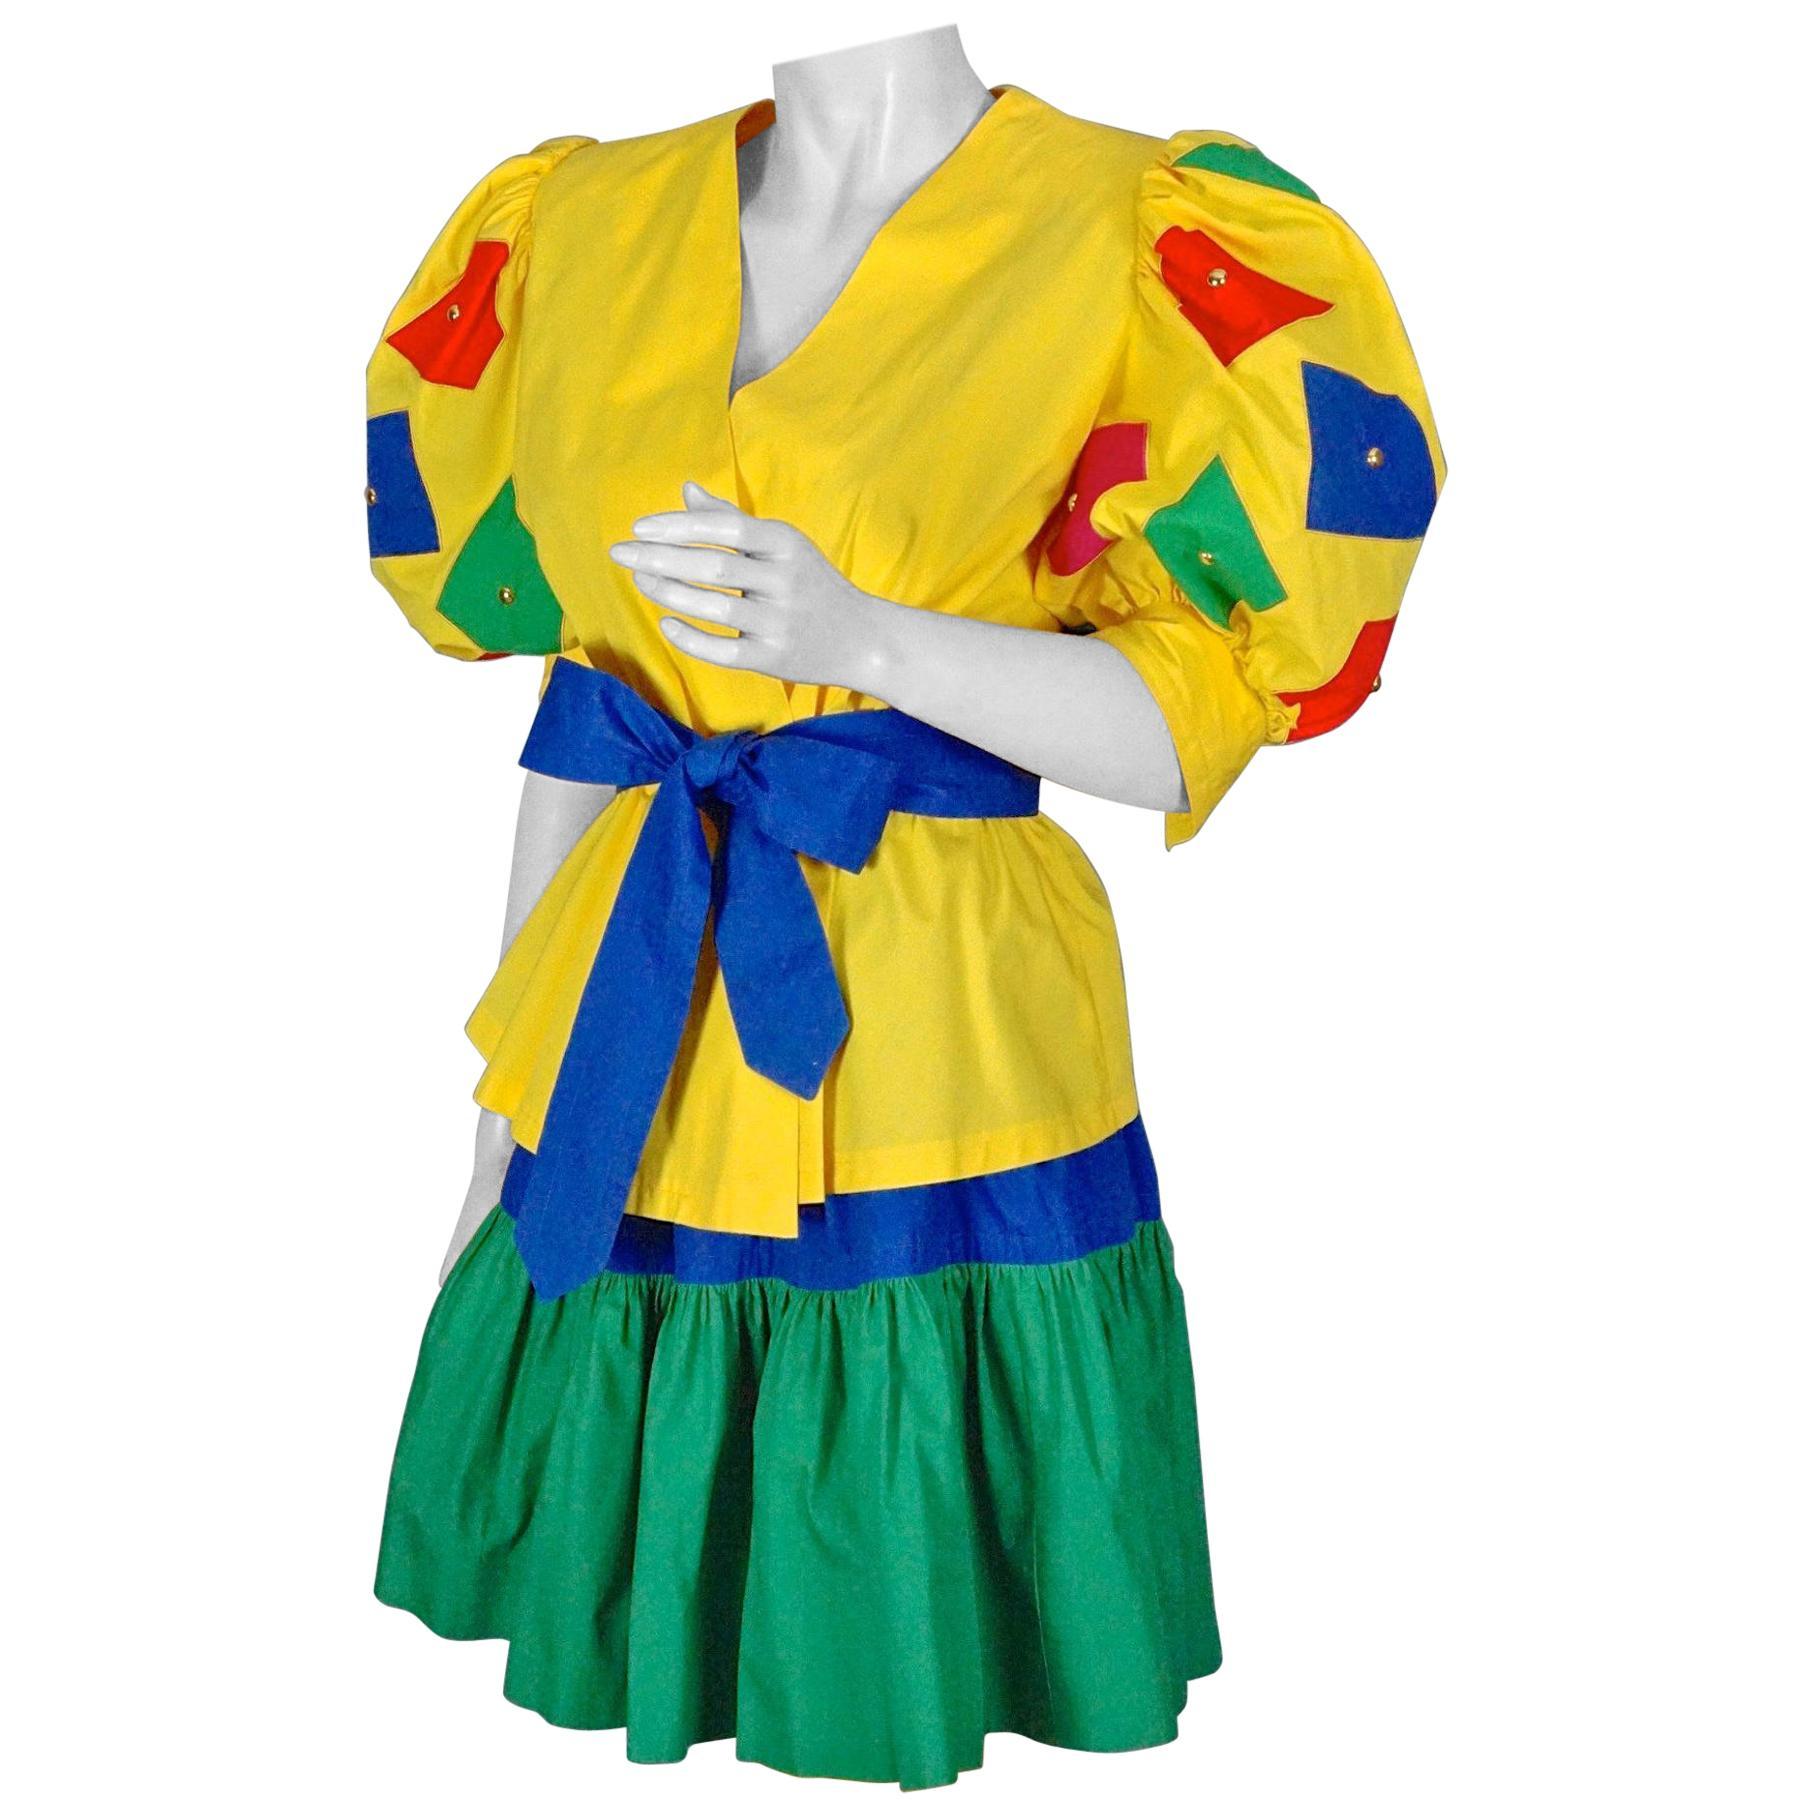 Vintage GIVENCHY NOUVELLE BOUTIQUE Color Block Balloon Sleeves Blouse Skirt Suit